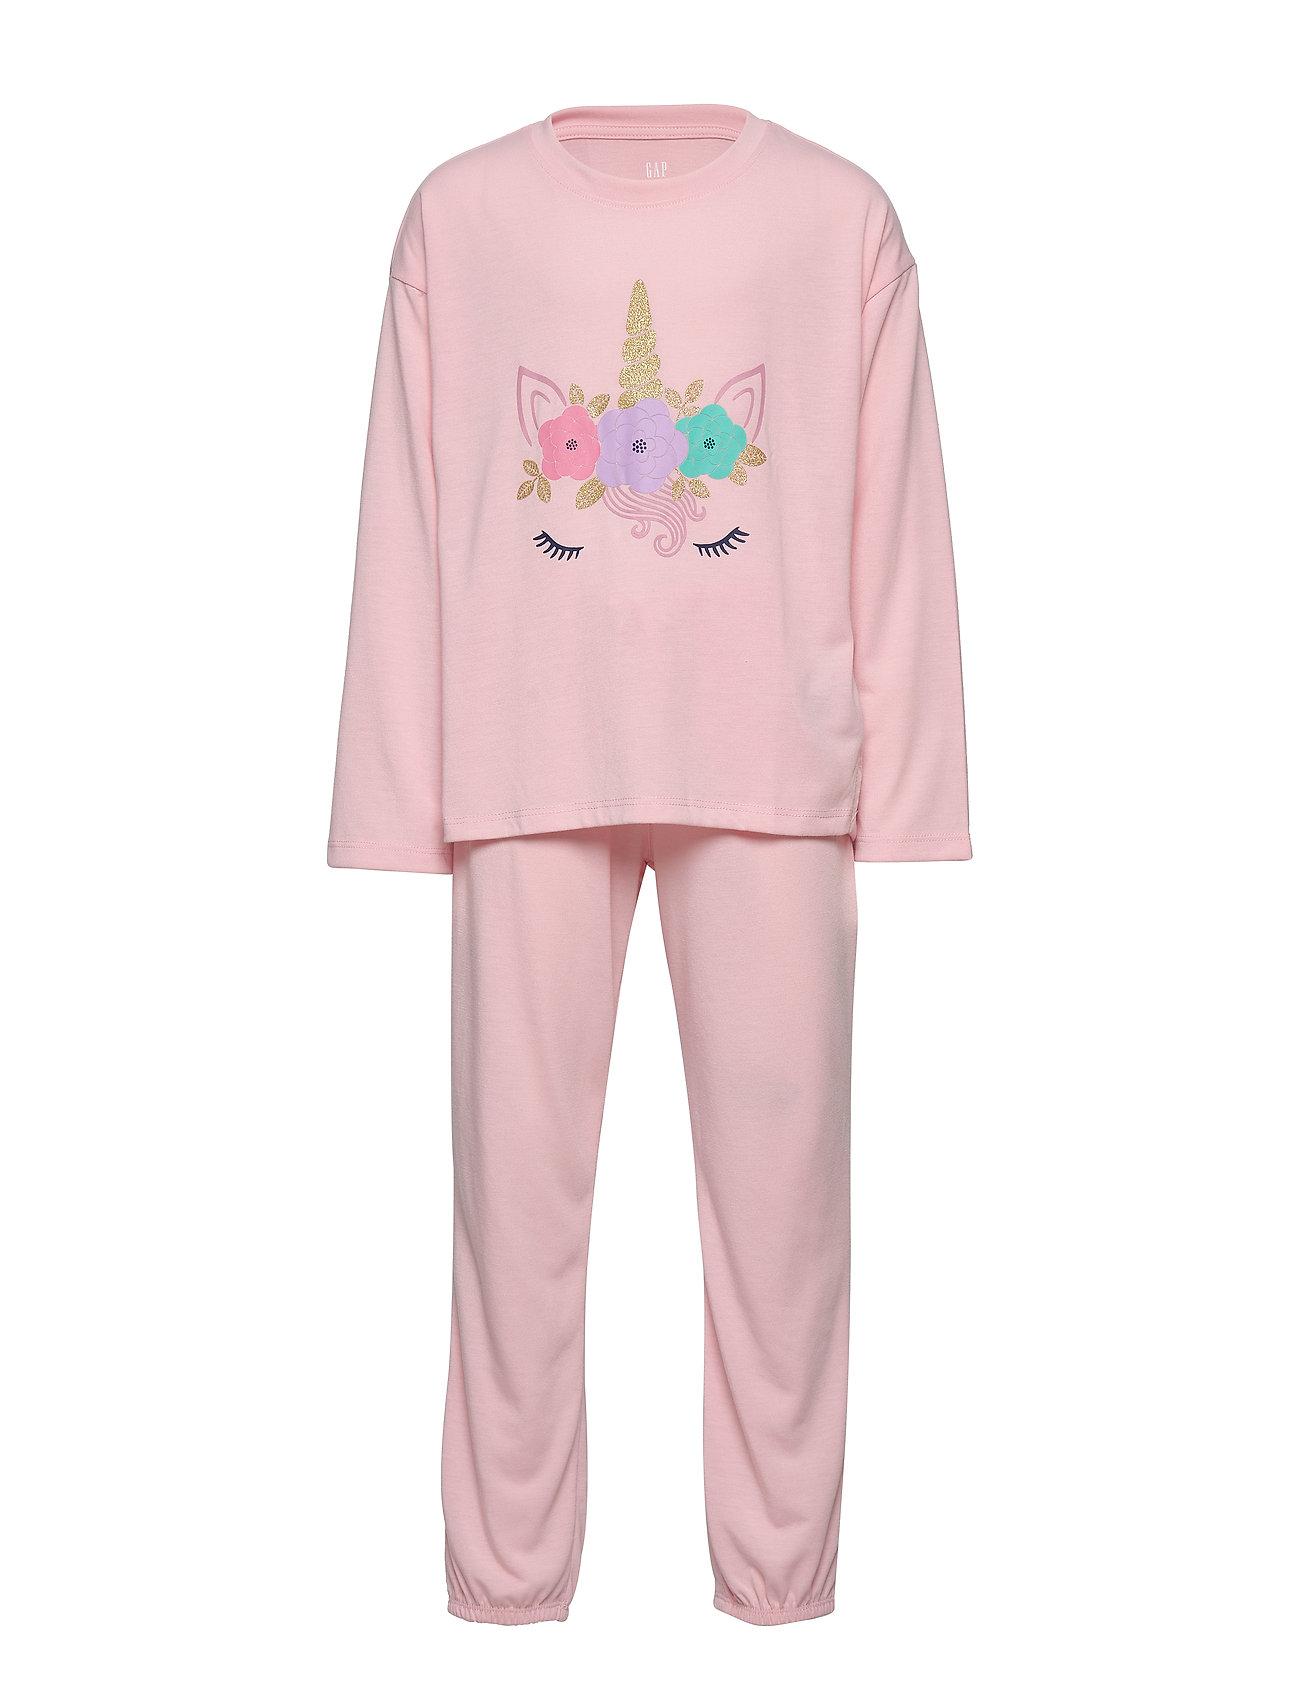 GAP Kids Unicorn PJ Set - ICY PINK